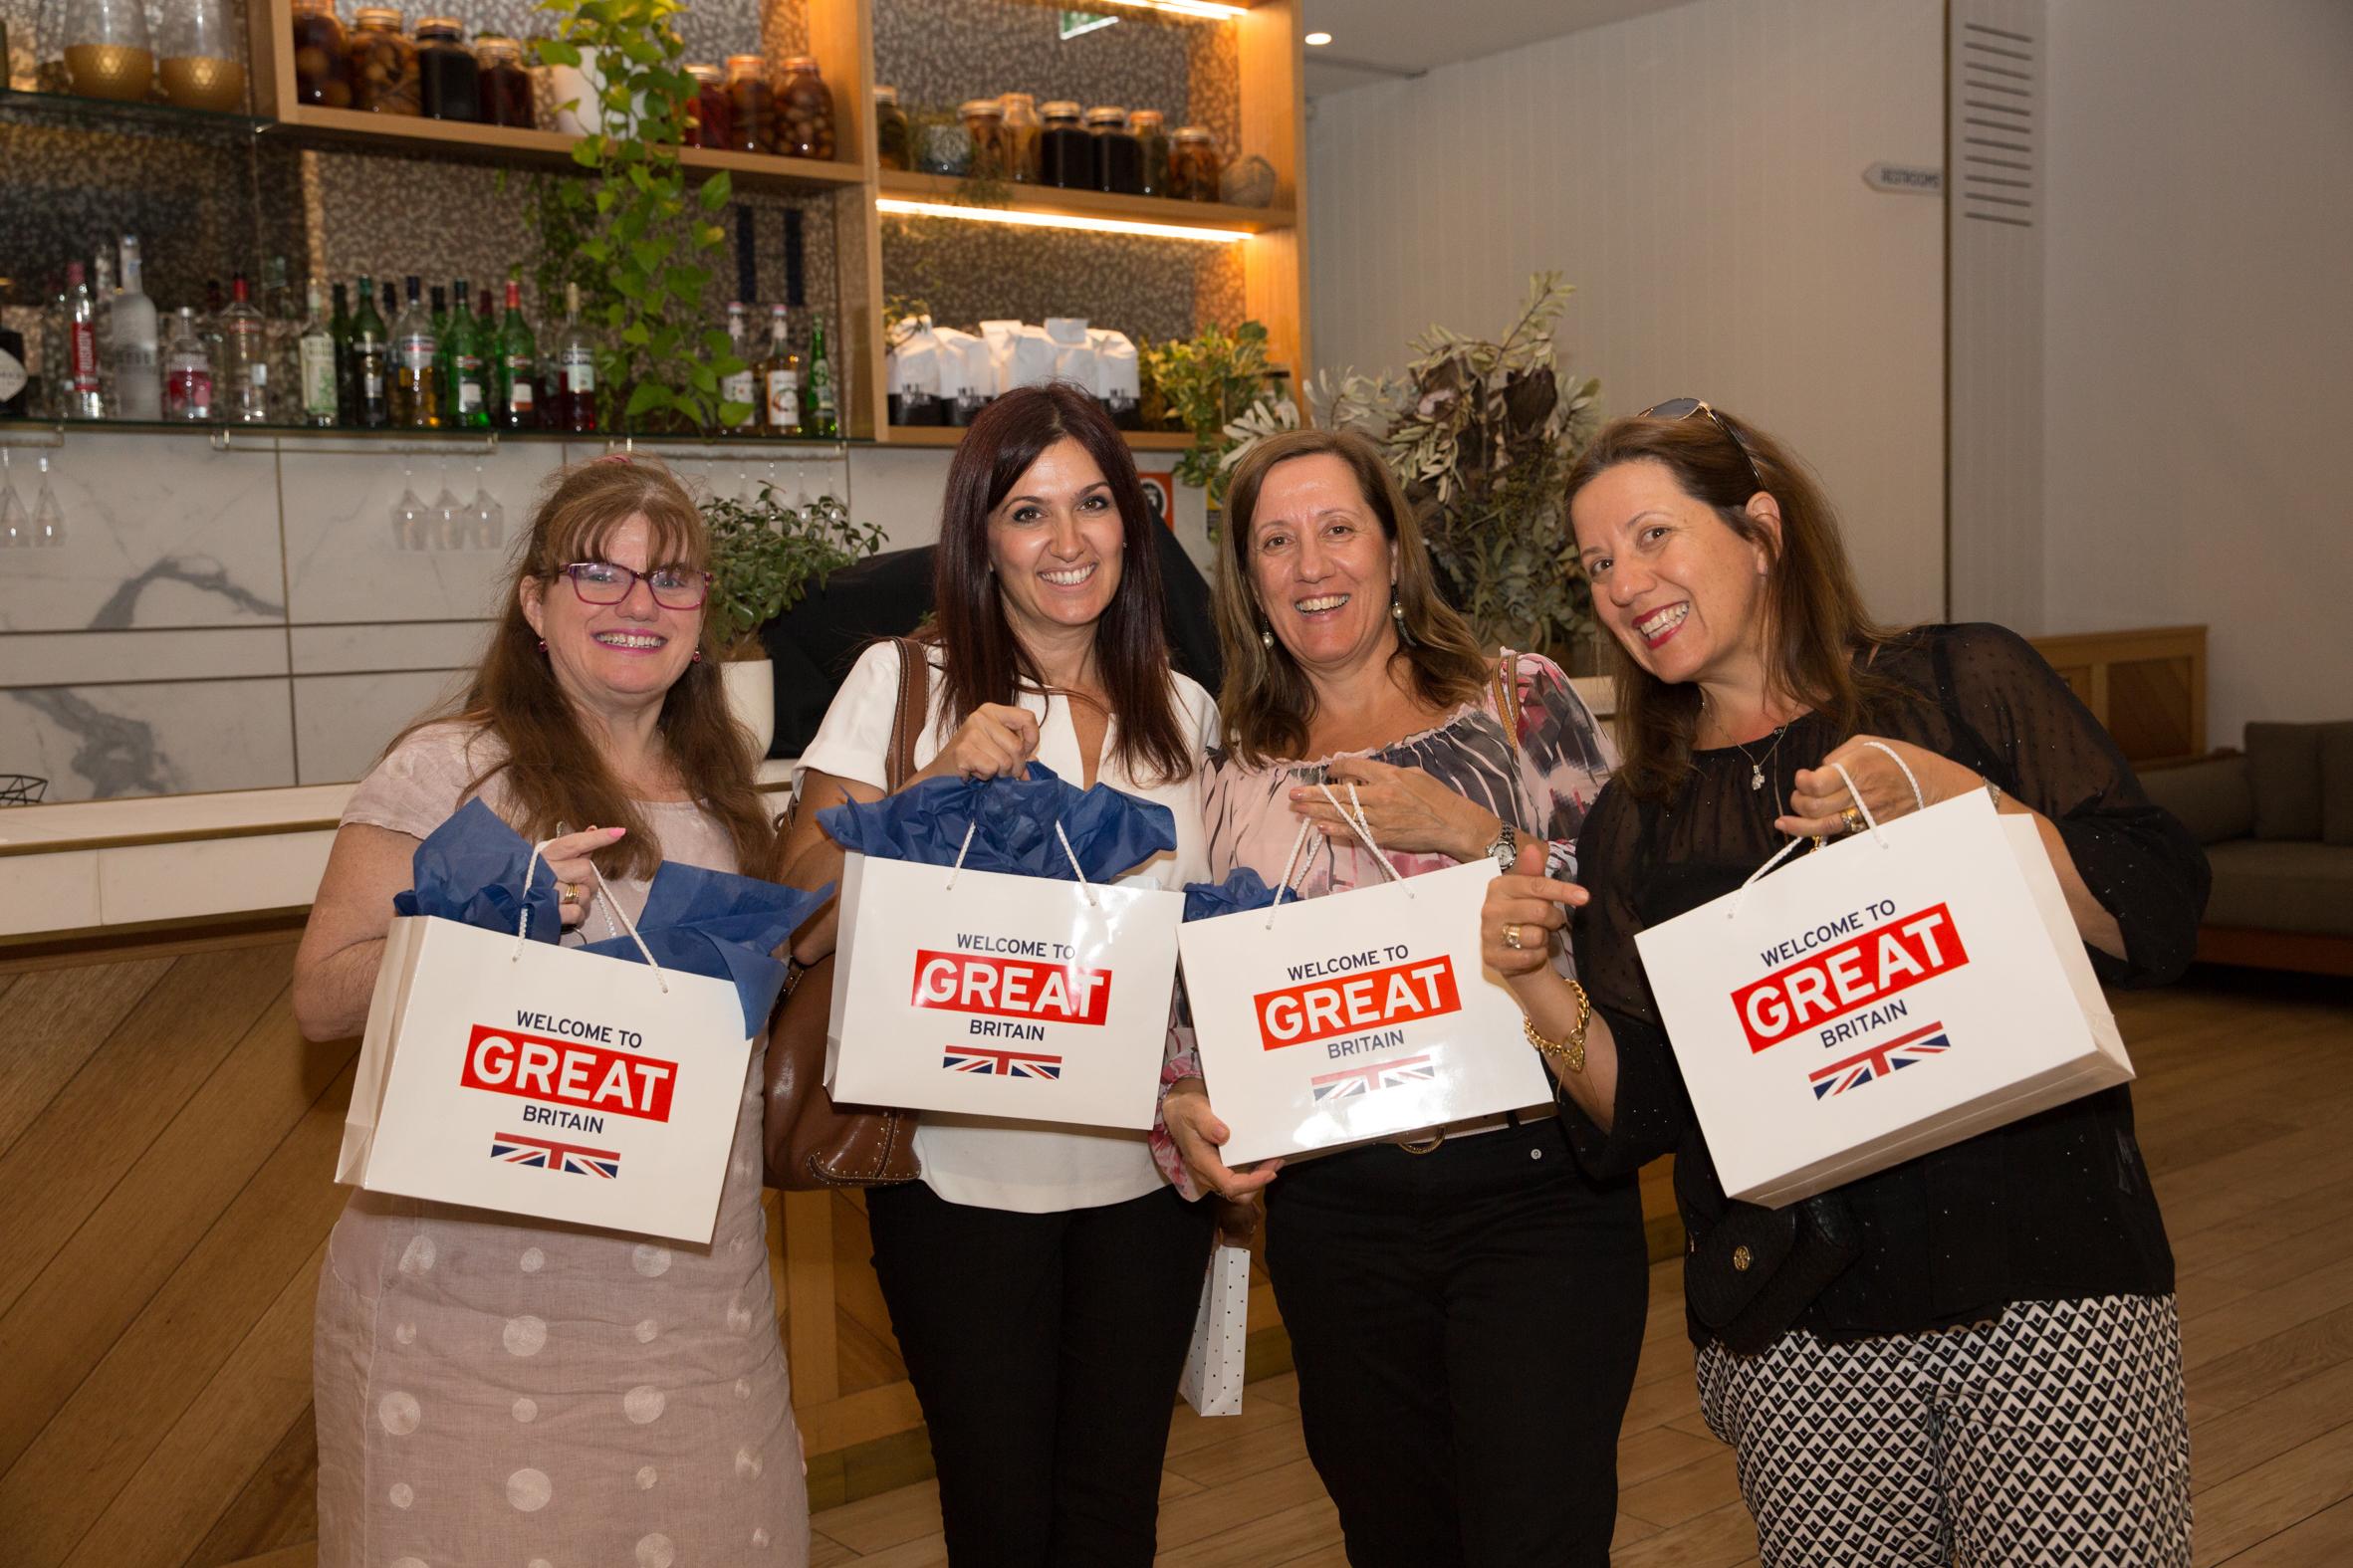 Excite Hosts Exclusive Great Britain Event photo